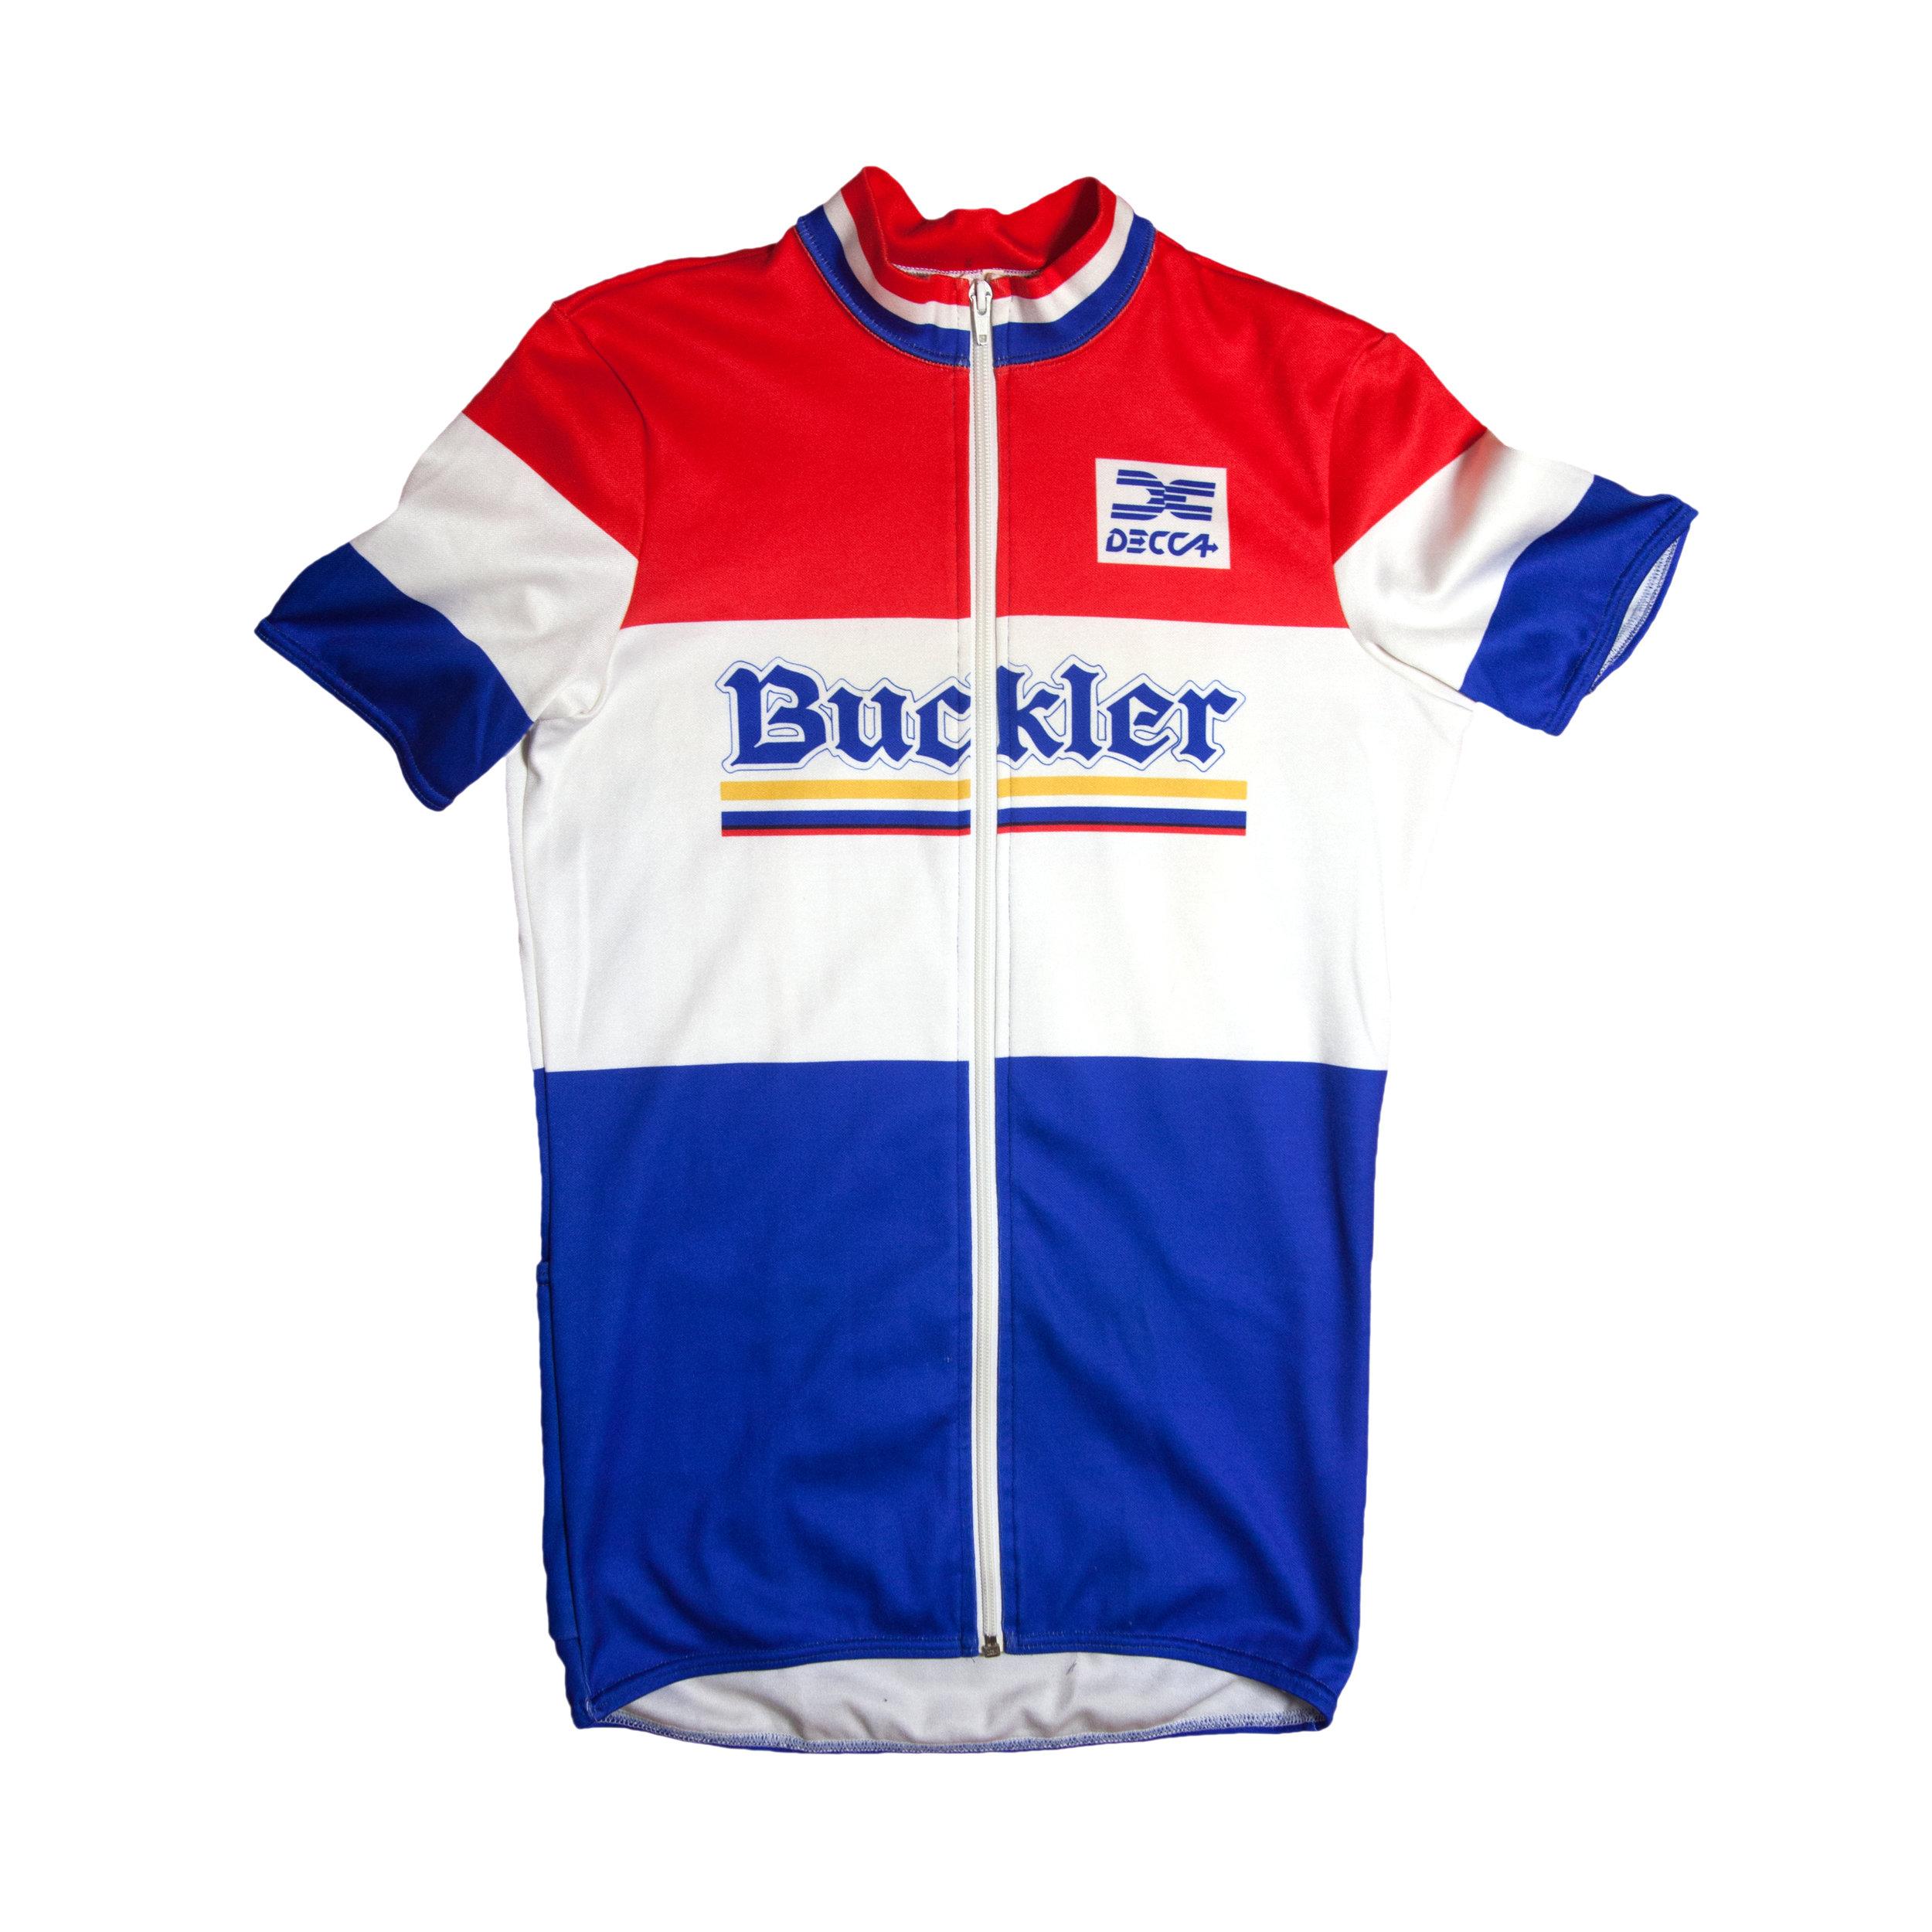 Bucklerb_Front.jpg